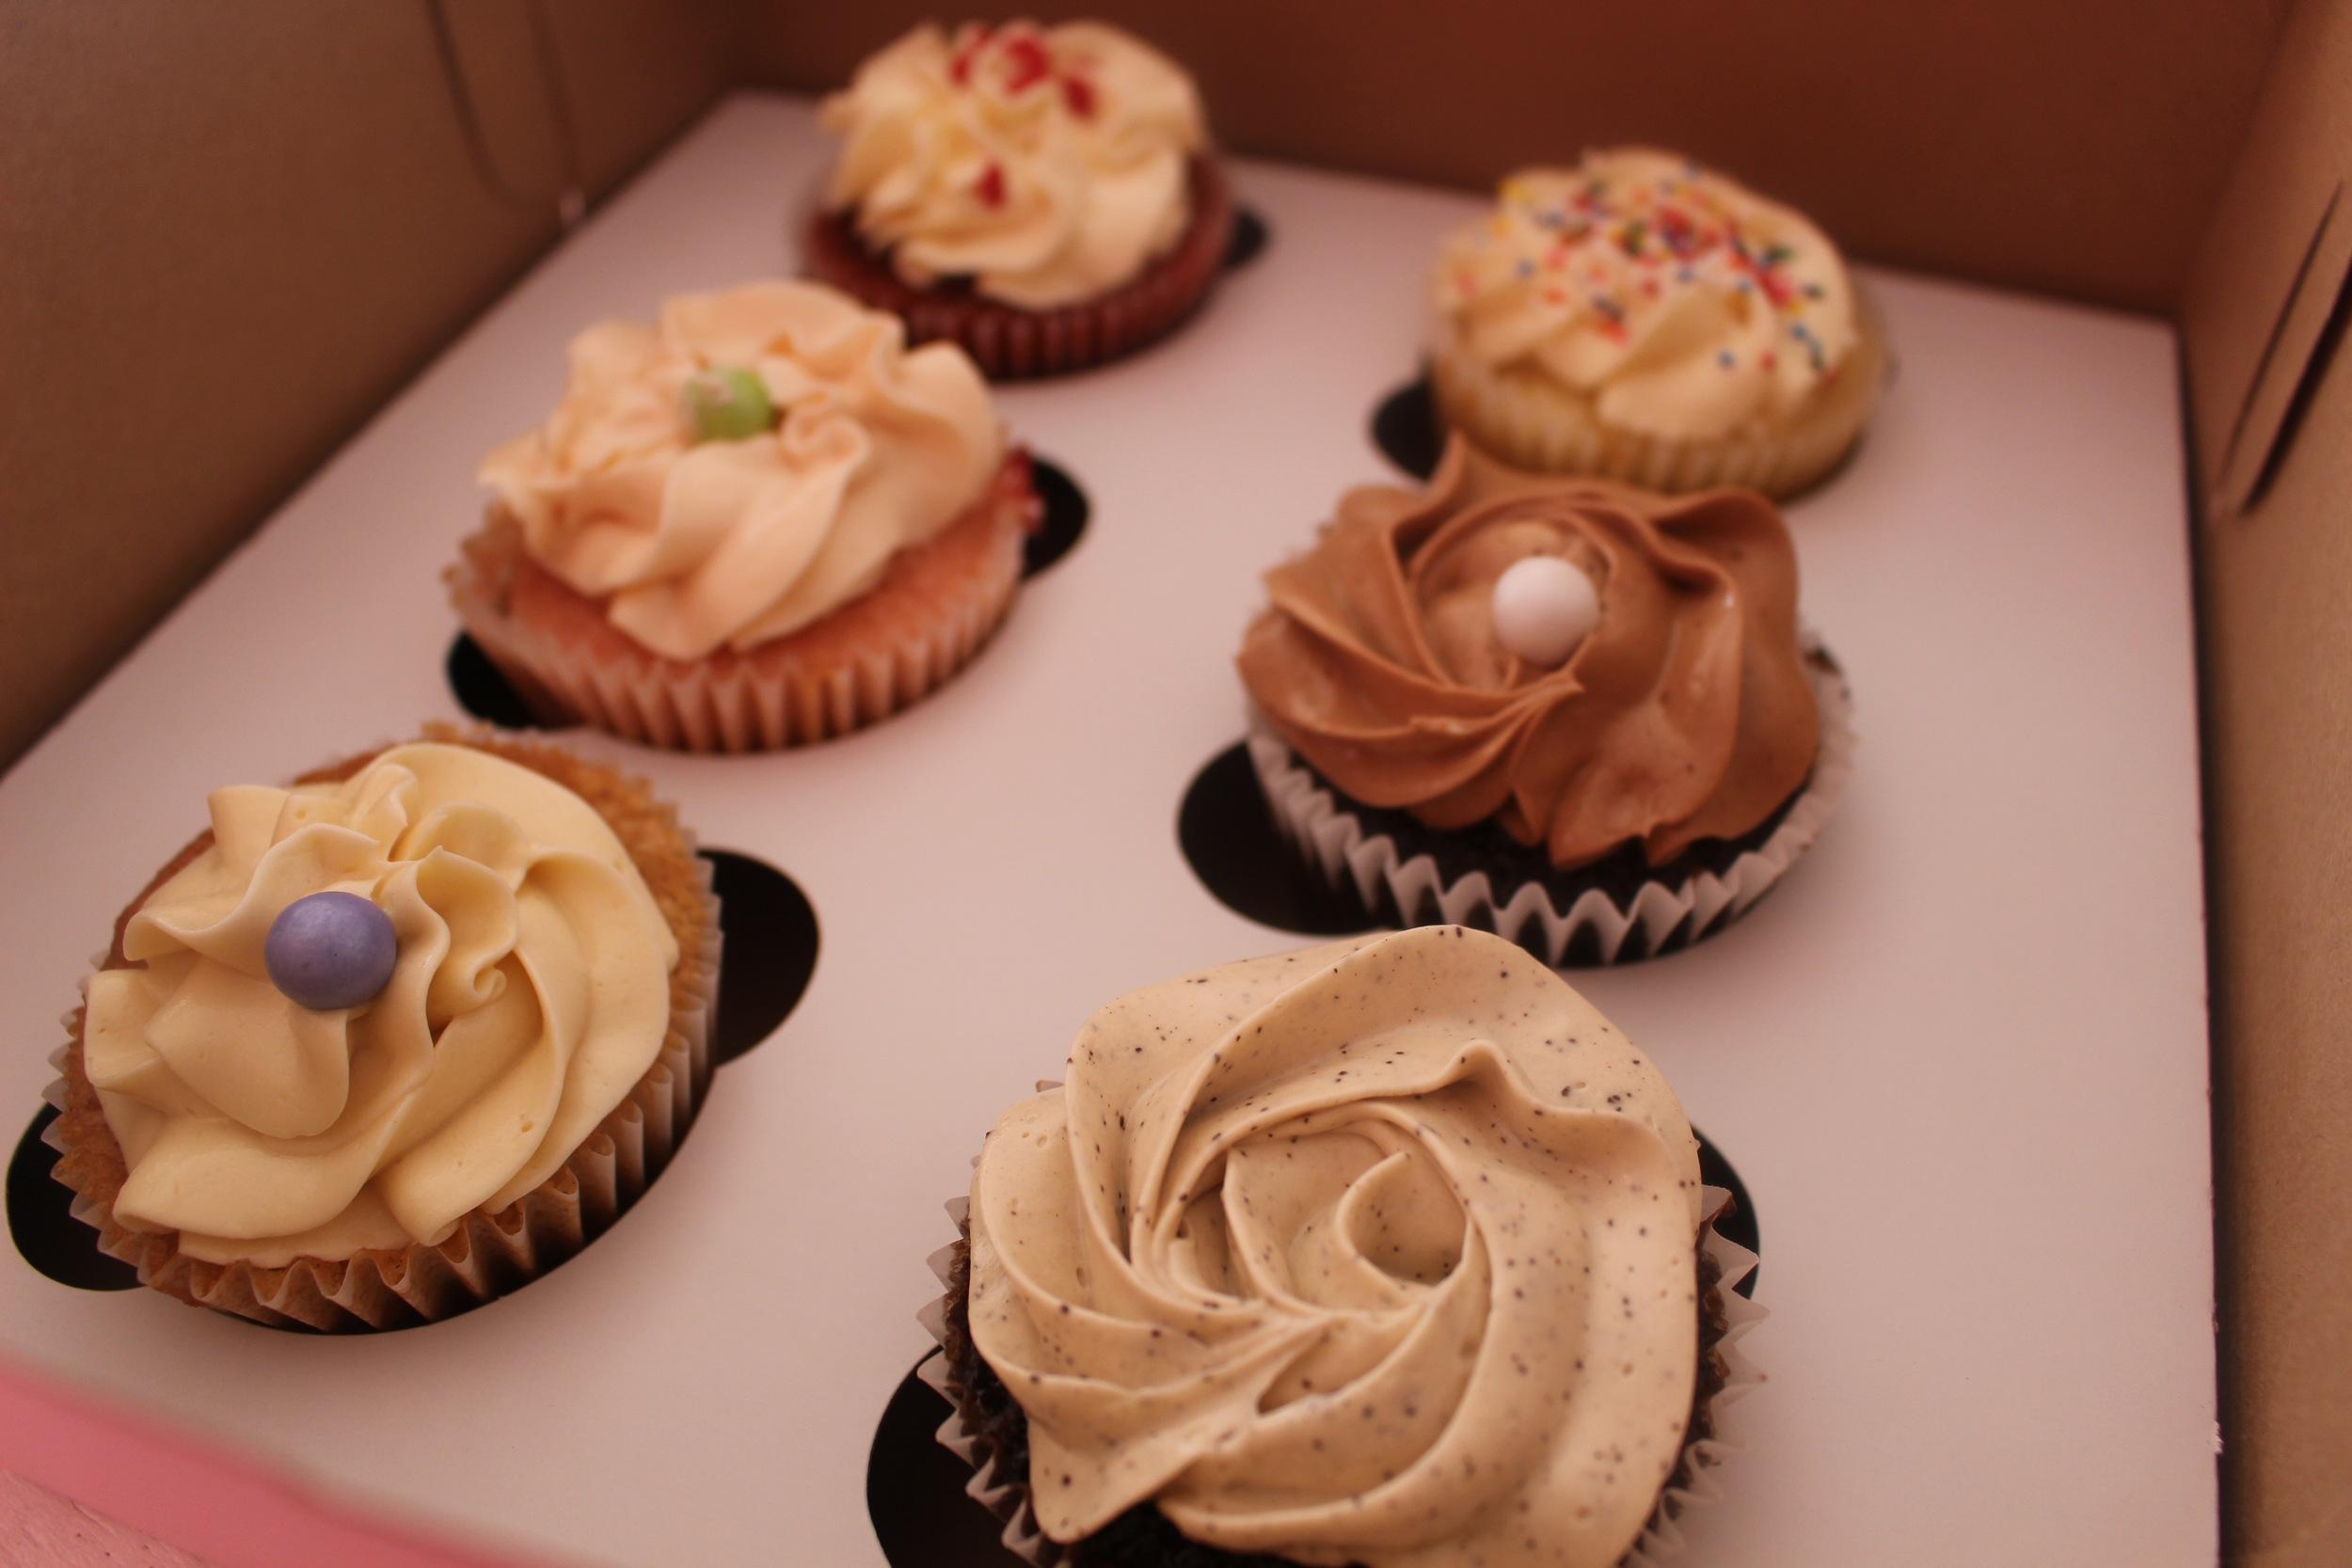 Lemon, Strawberry Red Velvet, Mocha, Chocolate, Vanilla order, The CuppyCake House